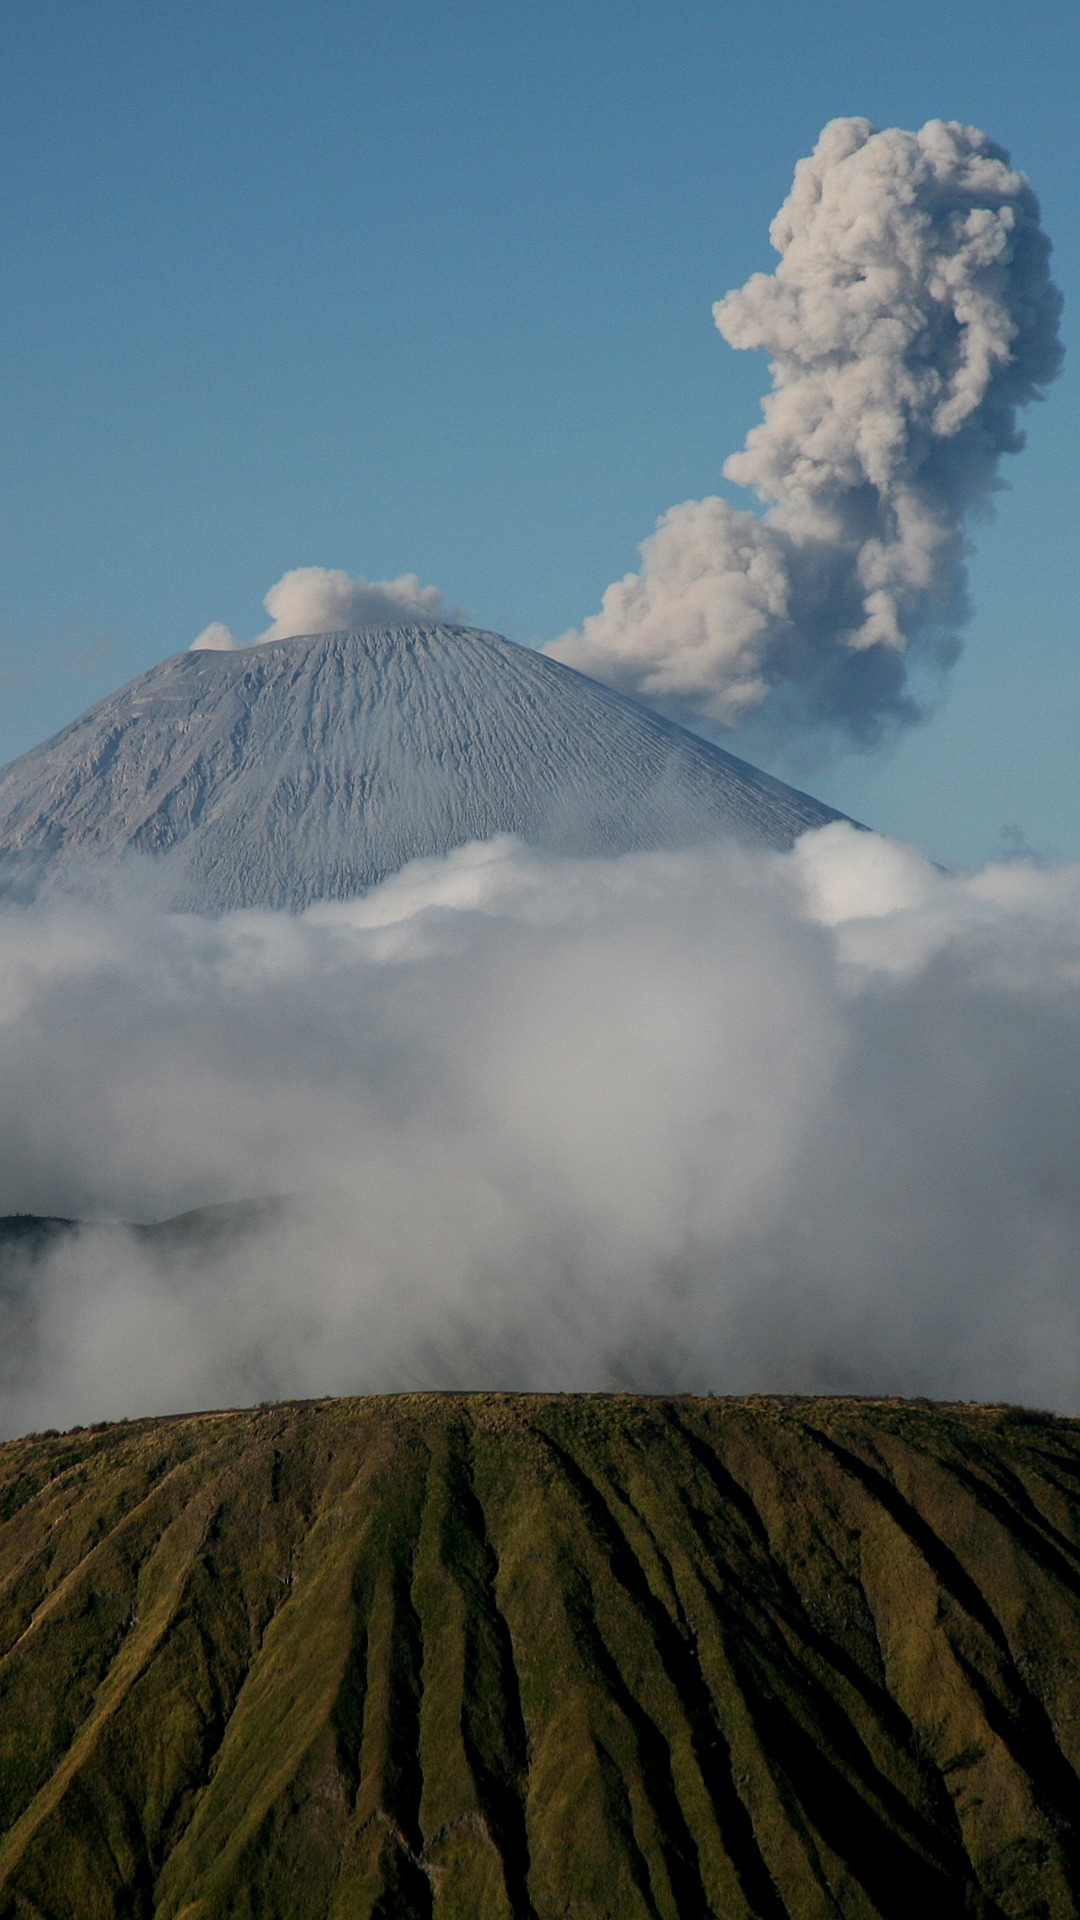 Wallpaper Hp Gunung Semeru : Mount Bromo Hd Nature 4k ...